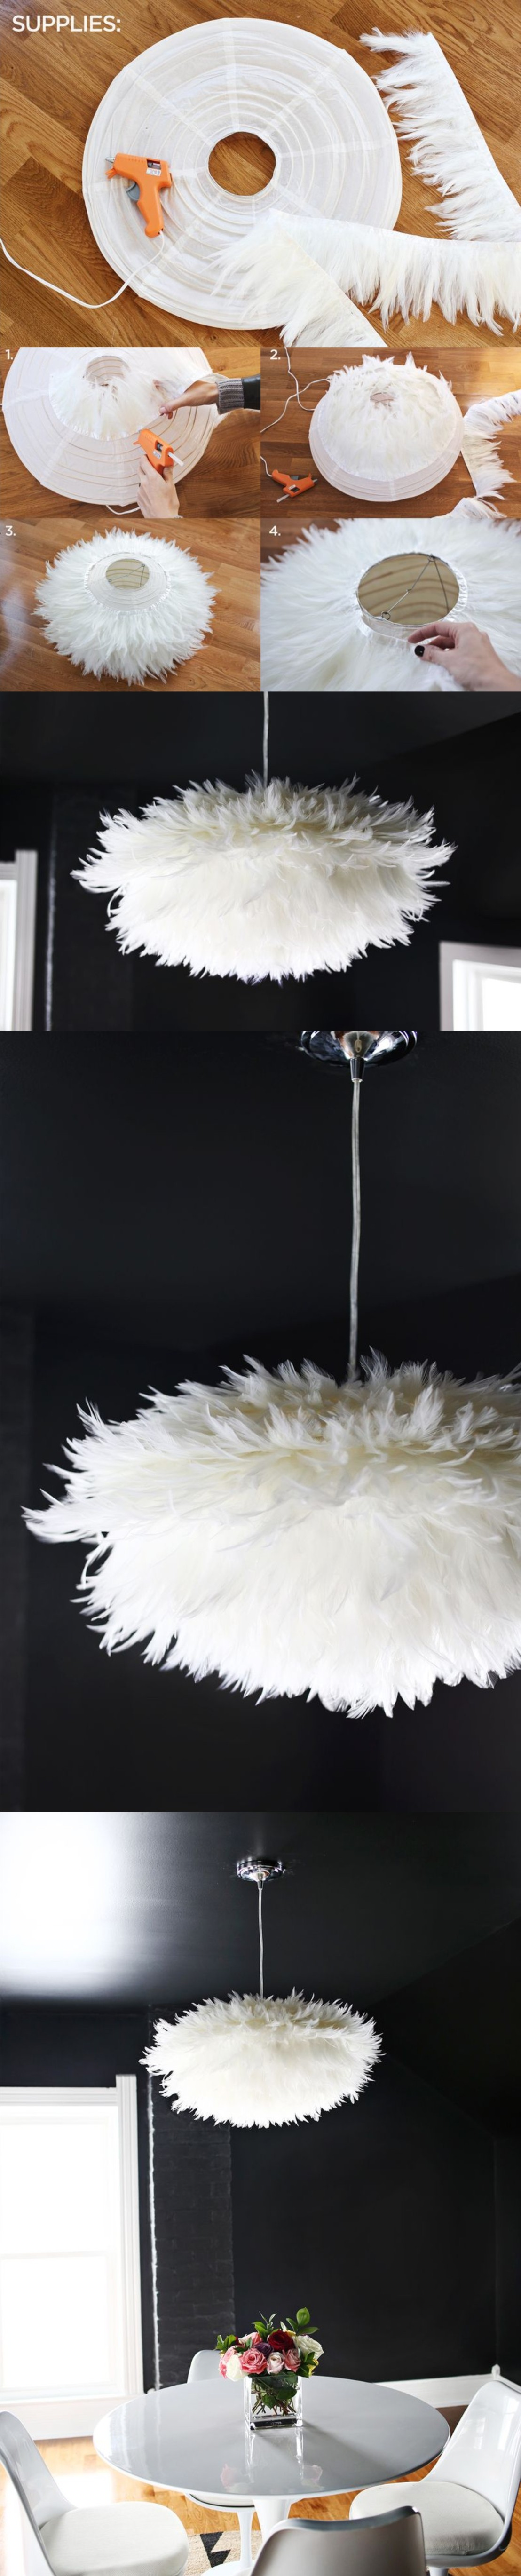 lampara-con-plumas-DIY-muy-ingenioso-2.jpg